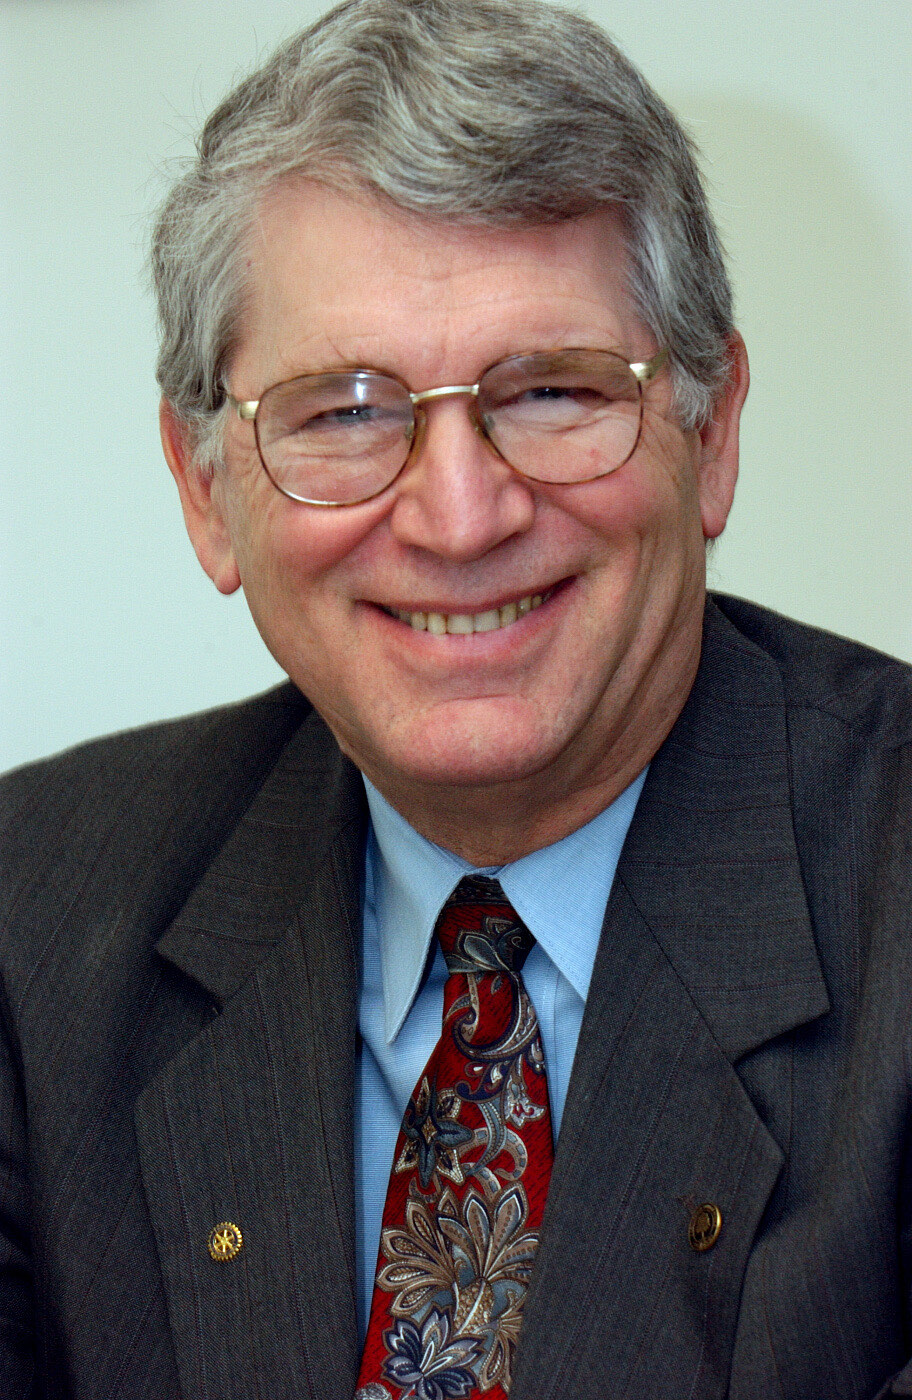 Joel Stevens, Kennebunk Savings Bank President and CEO